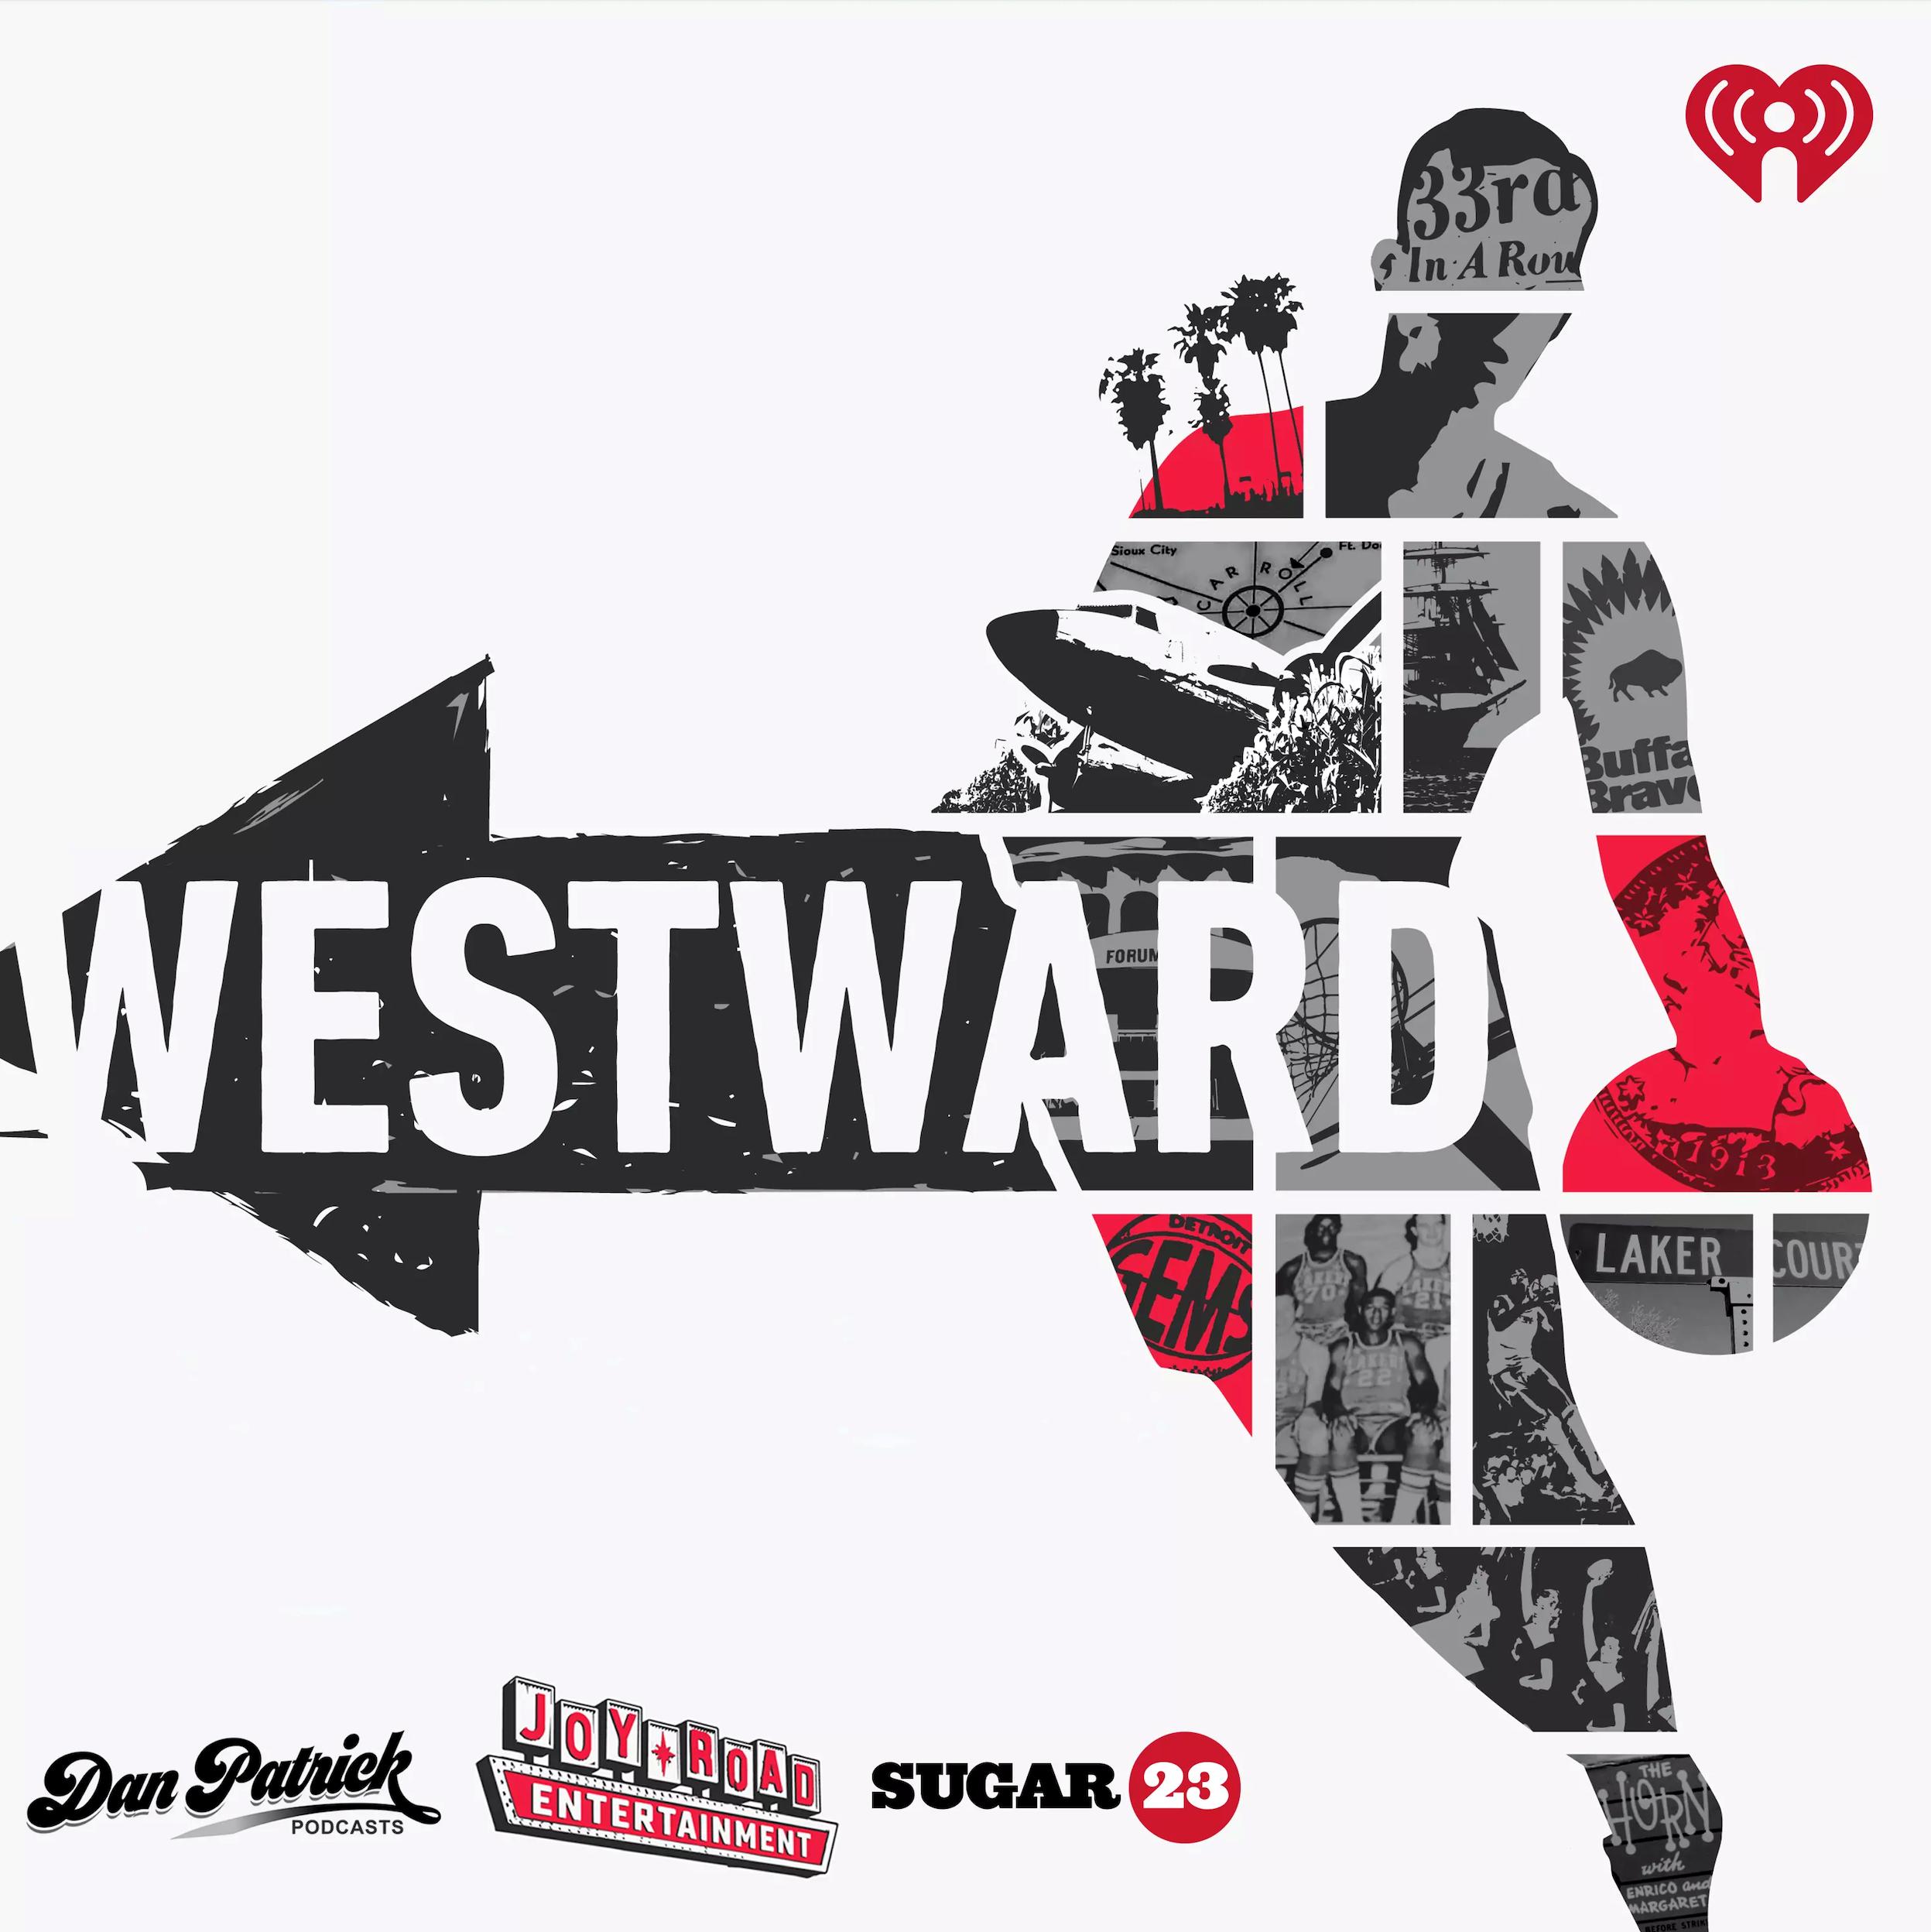 westward podcast